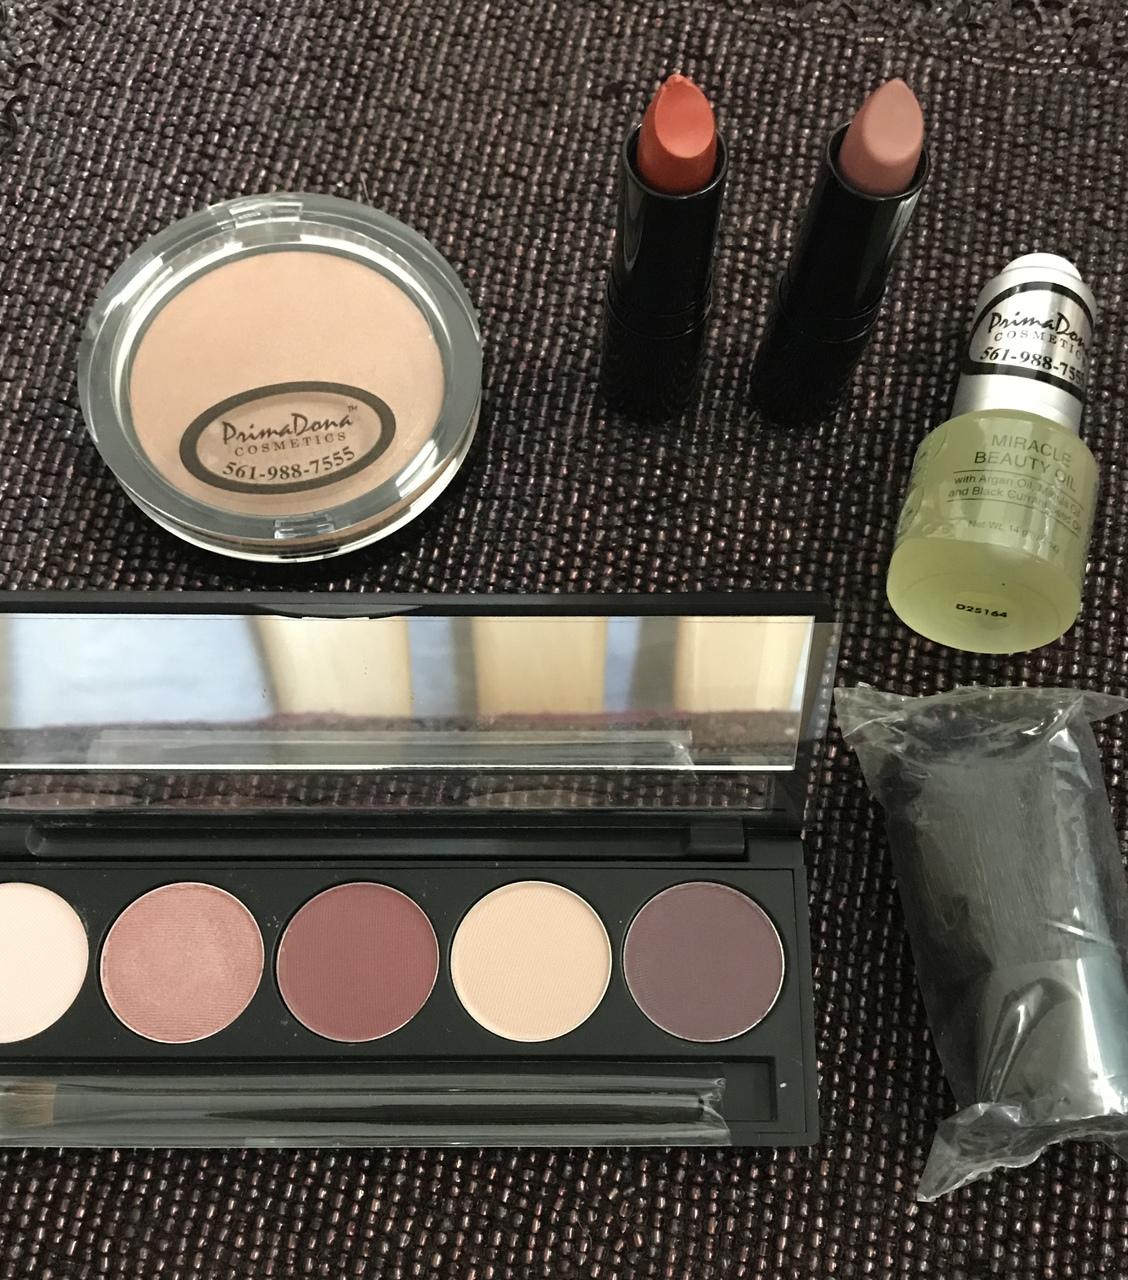 PrimaDona Cosmetics Package